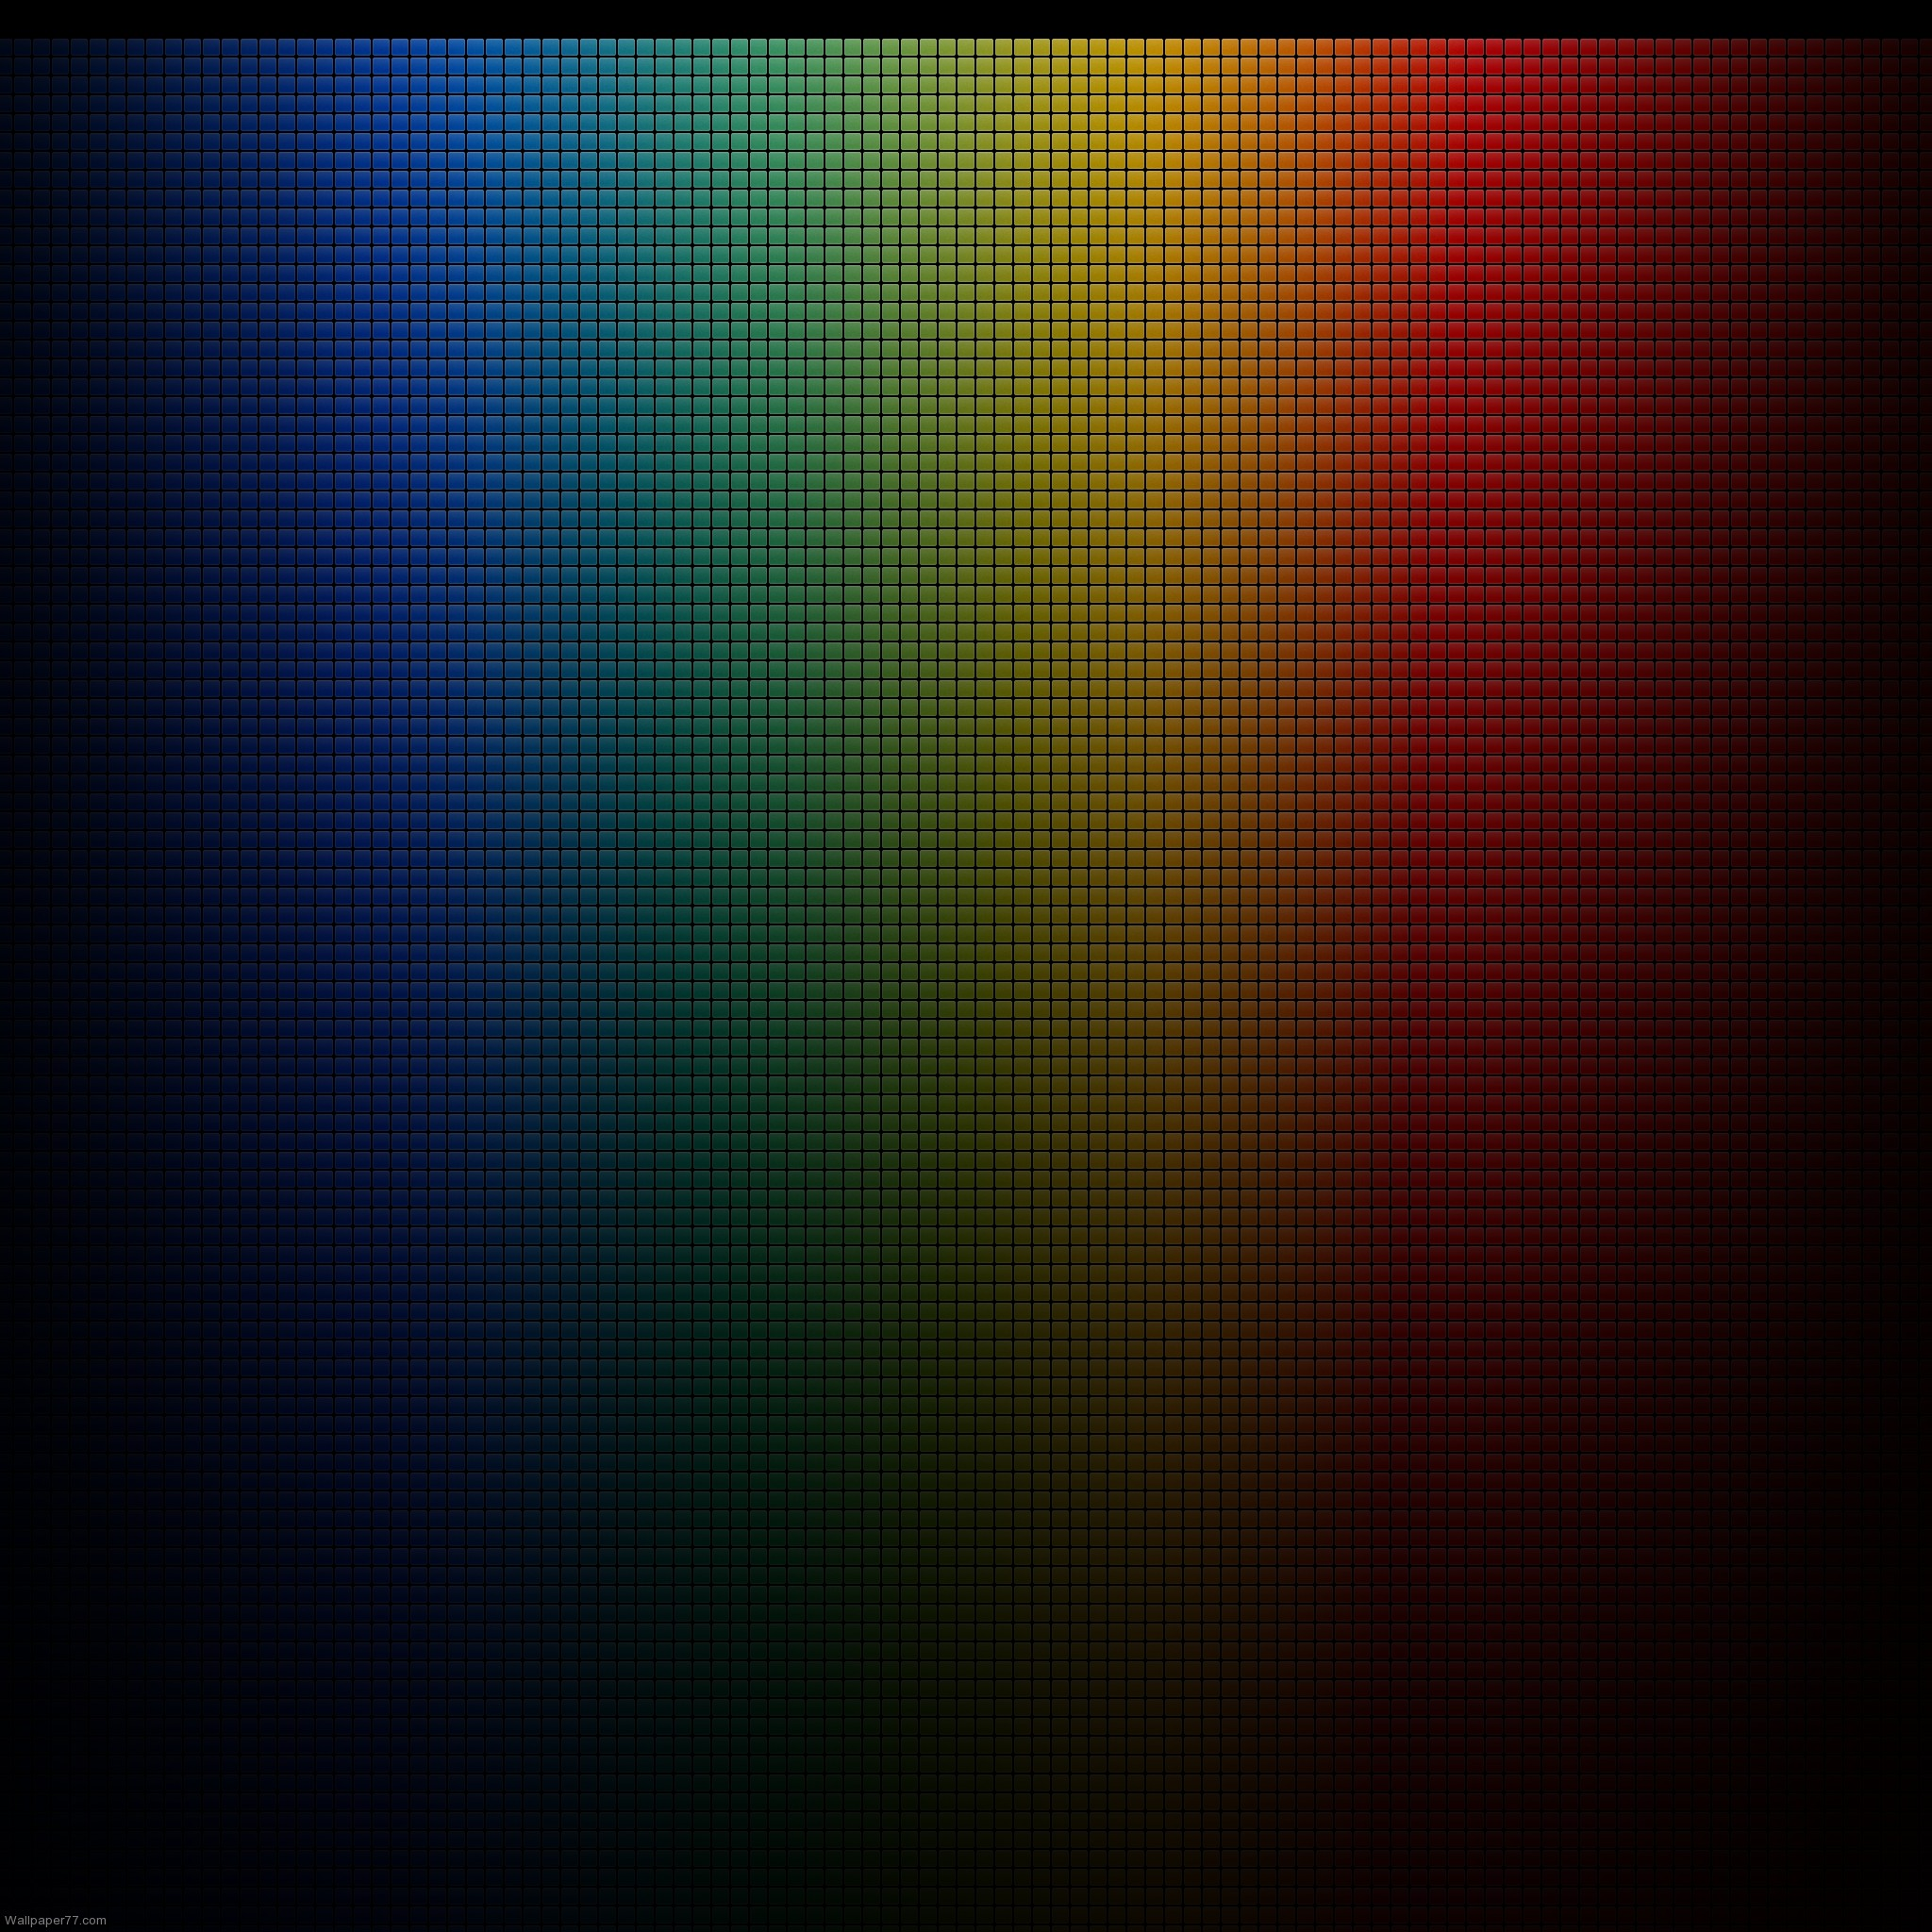 50 ipad 4 retina display wallpapers on wallpapersafari - Retina display wallpapers ipad 2 ...